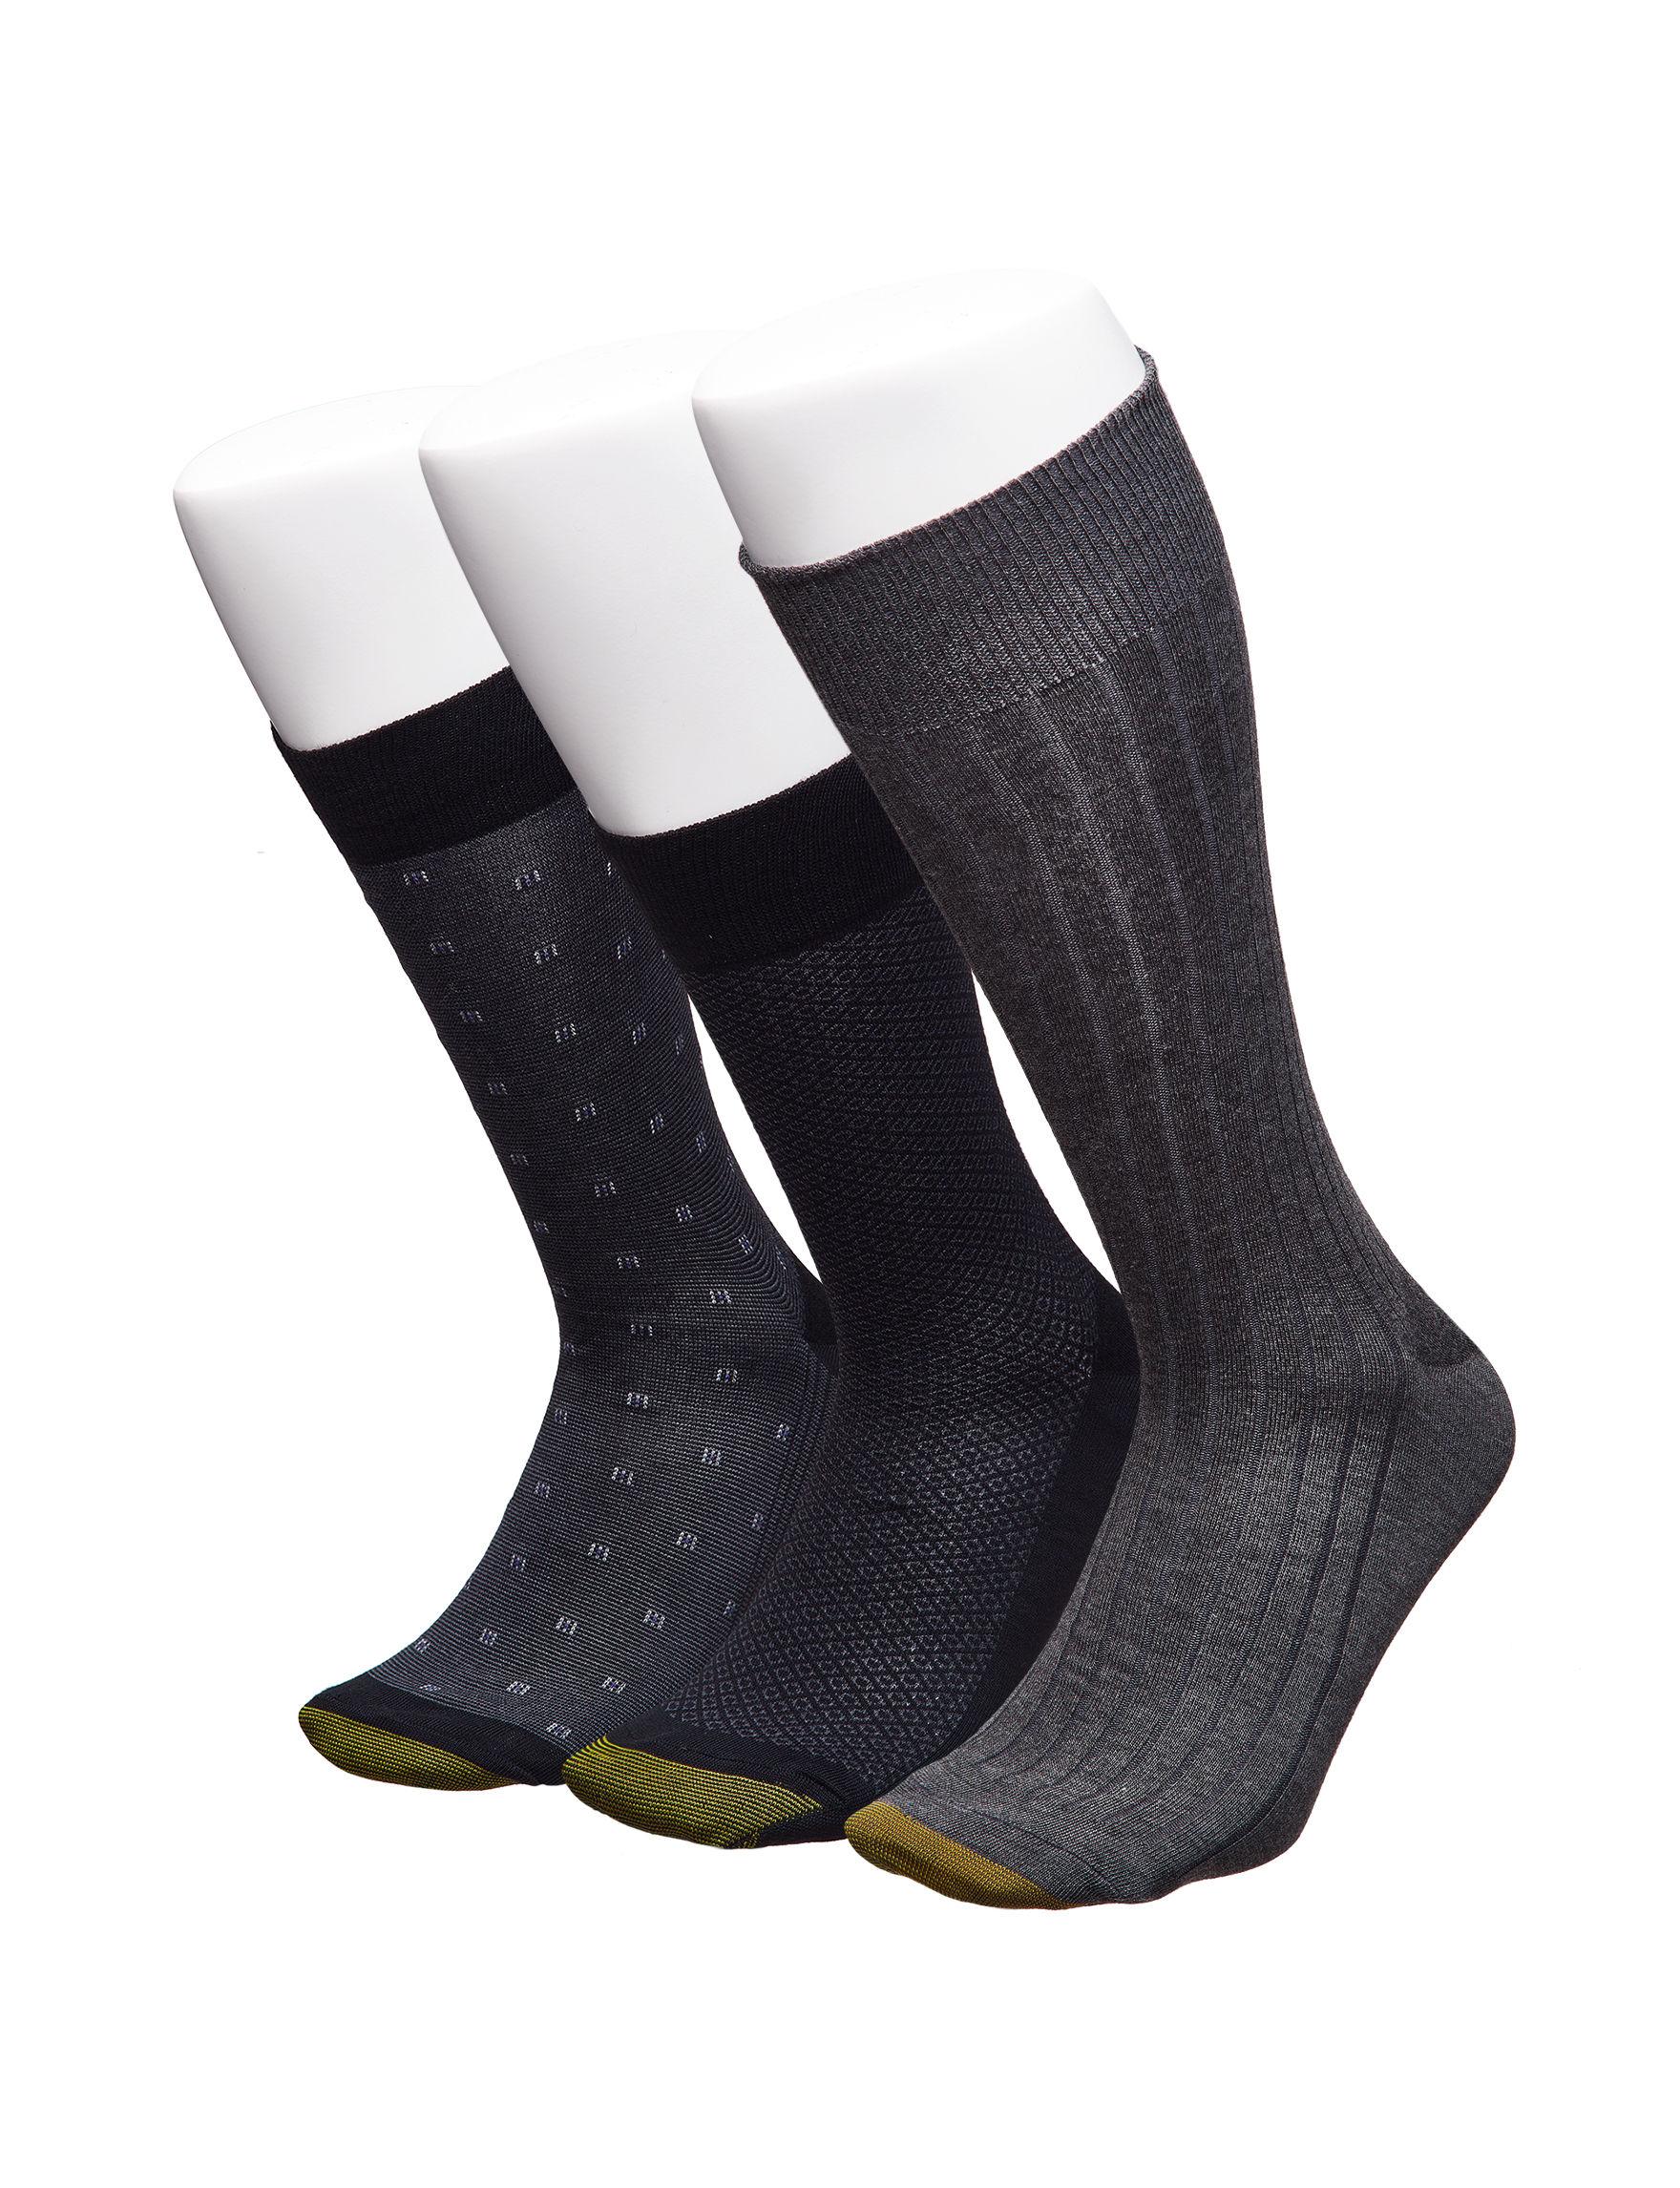 Gold Toe Grey Socks